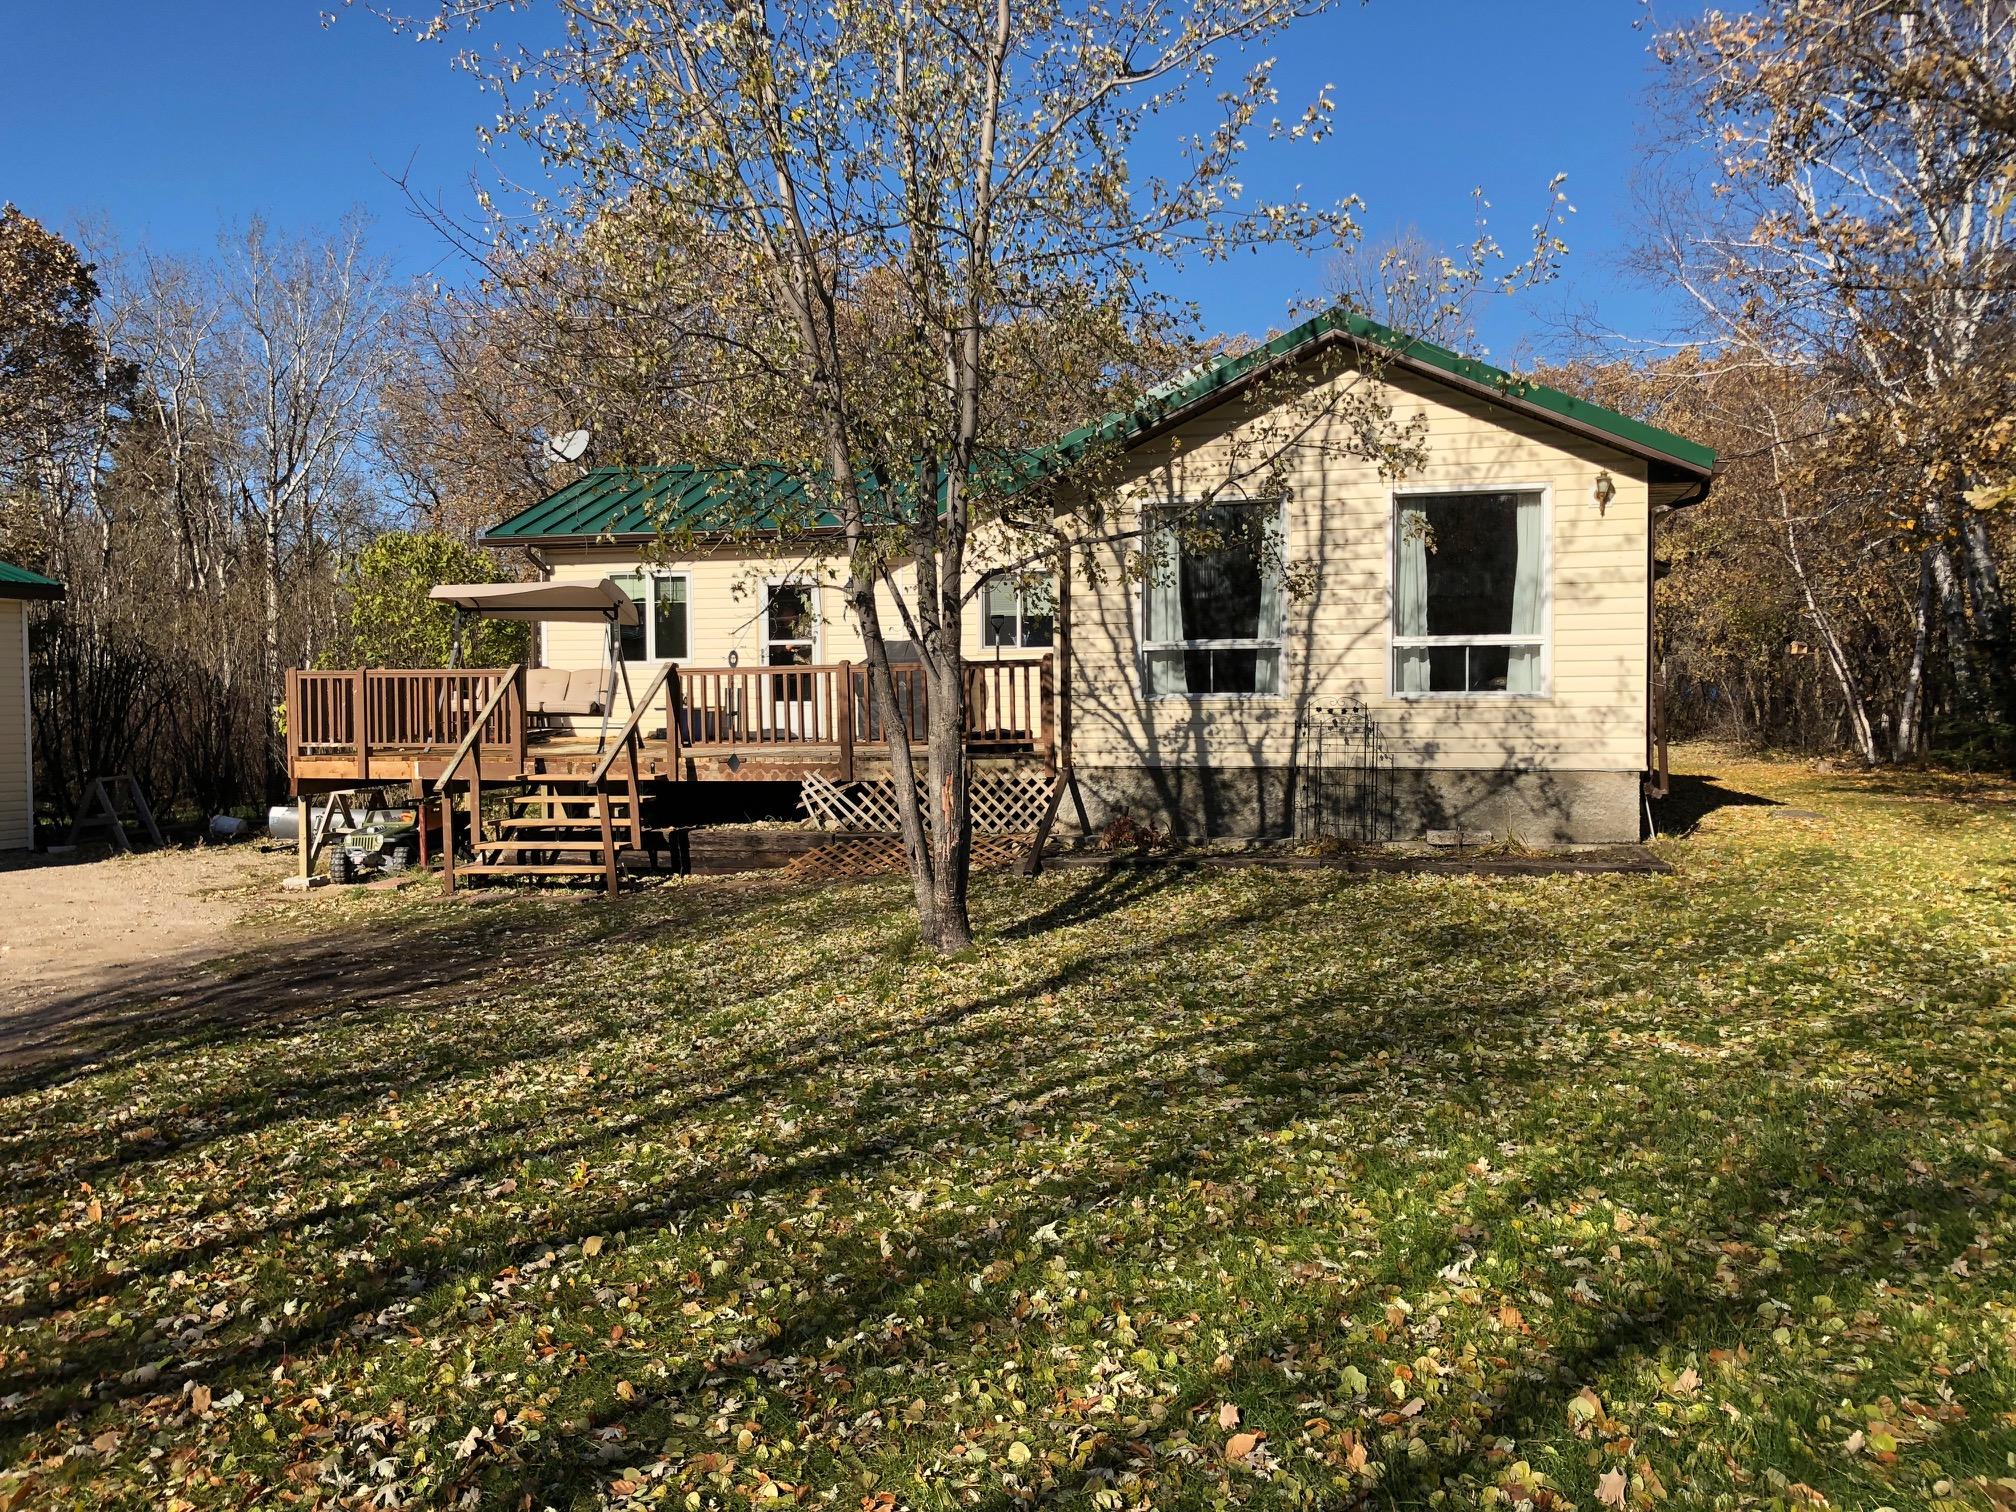 real estate listings for lake winnipeg manitoba canada ateah rh ateahrealty com